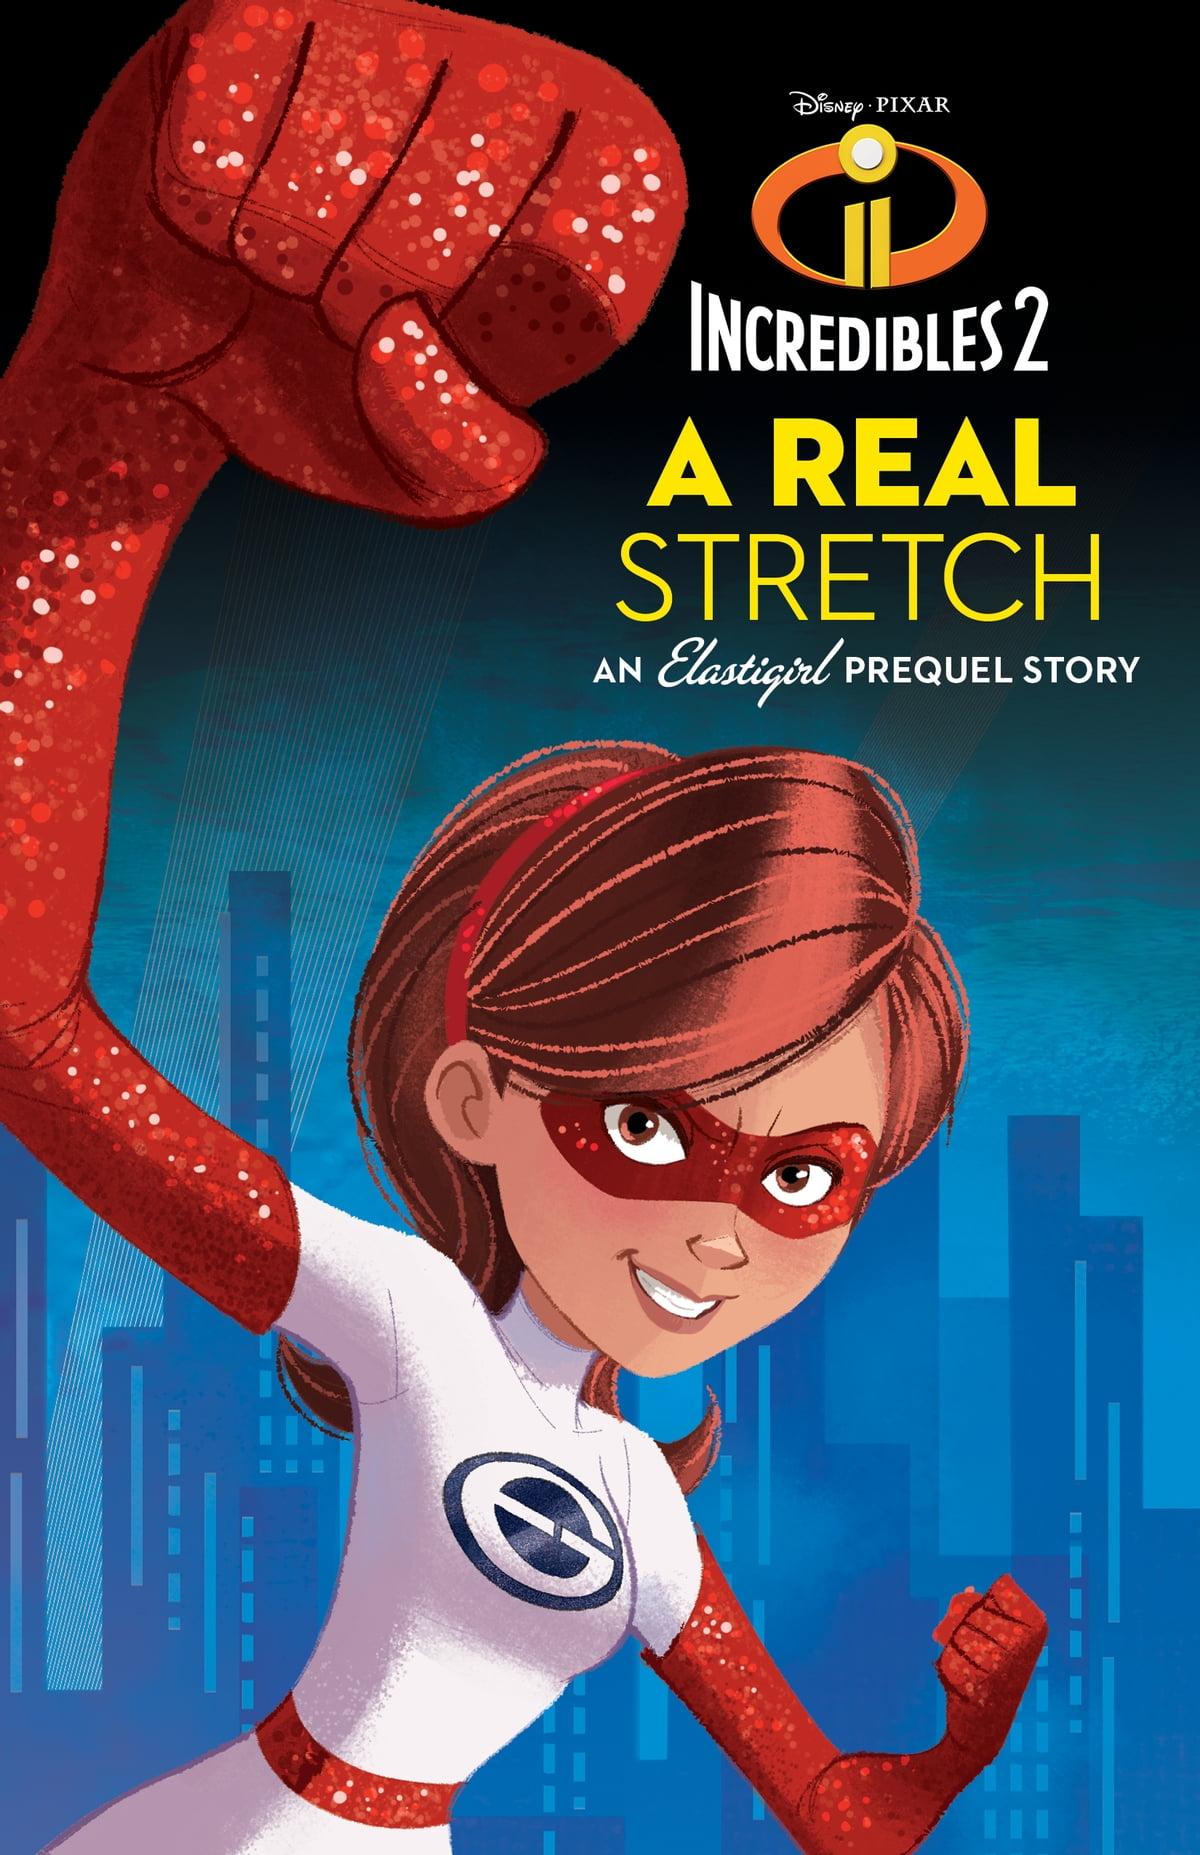 Incredibles 2: A Real Stretch: An Elastigirl Prequel Story eBook by Disney Books - 9781368017176   Rakuten Kobo